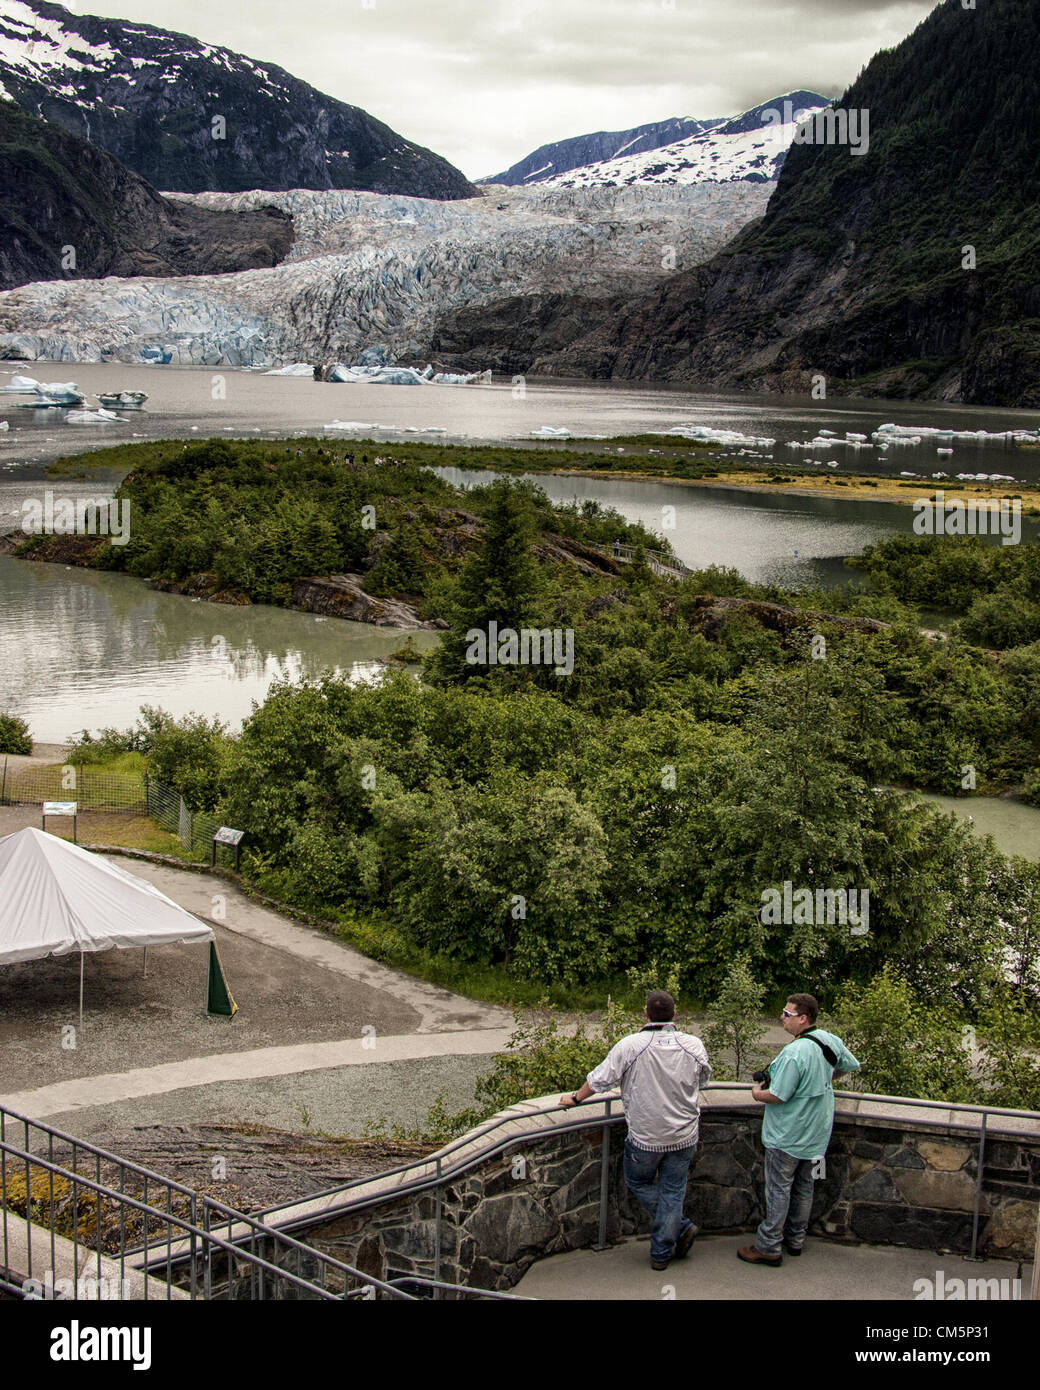 July 5, 2012 - Borough Of Juneau, Alaska, US - Mendenhall Glacier, surrounded by the majestic Coast Mountain Range, - Stock Image